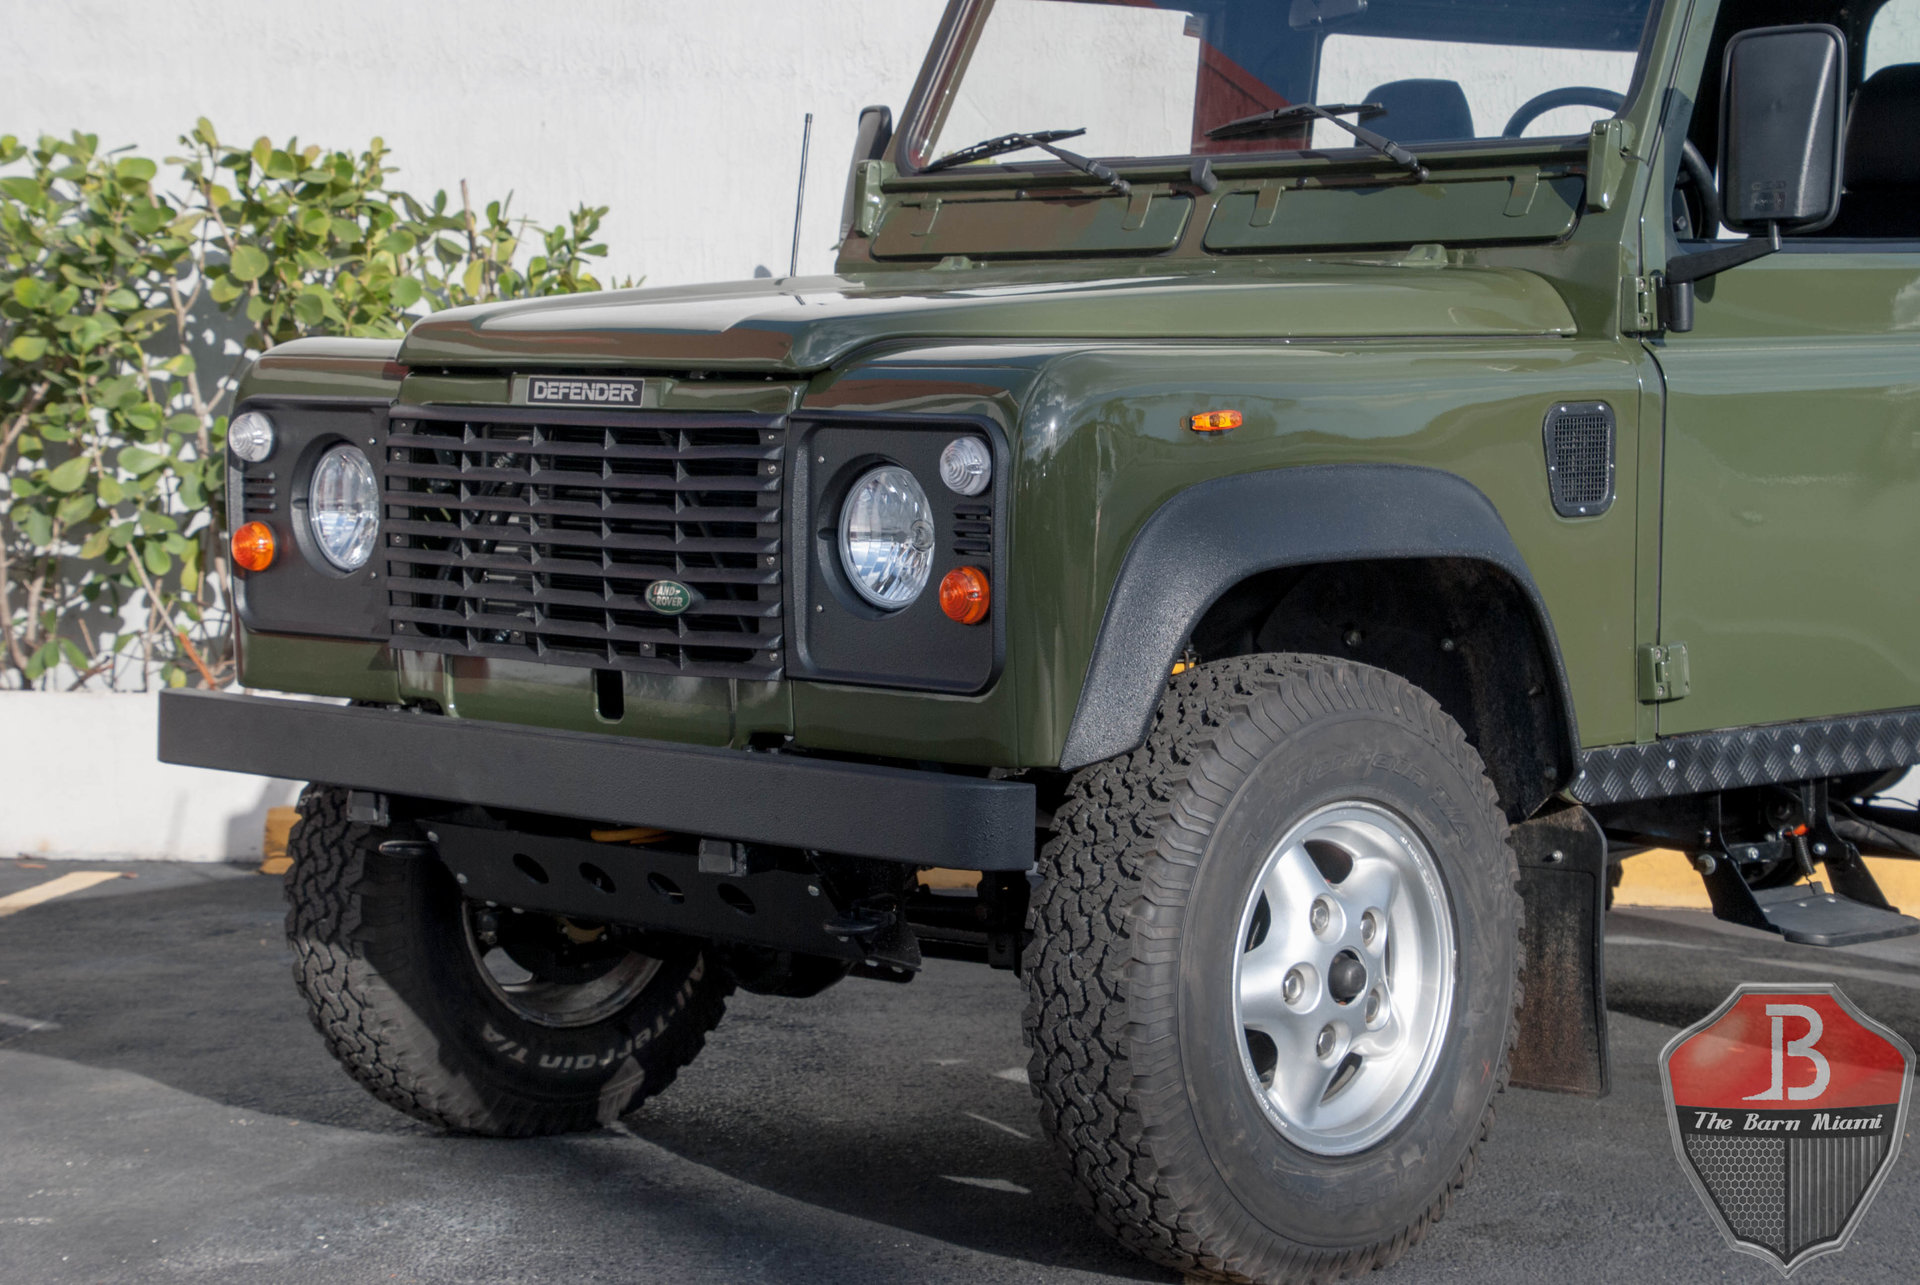 1988 Land Rover Defender The Barn Miami